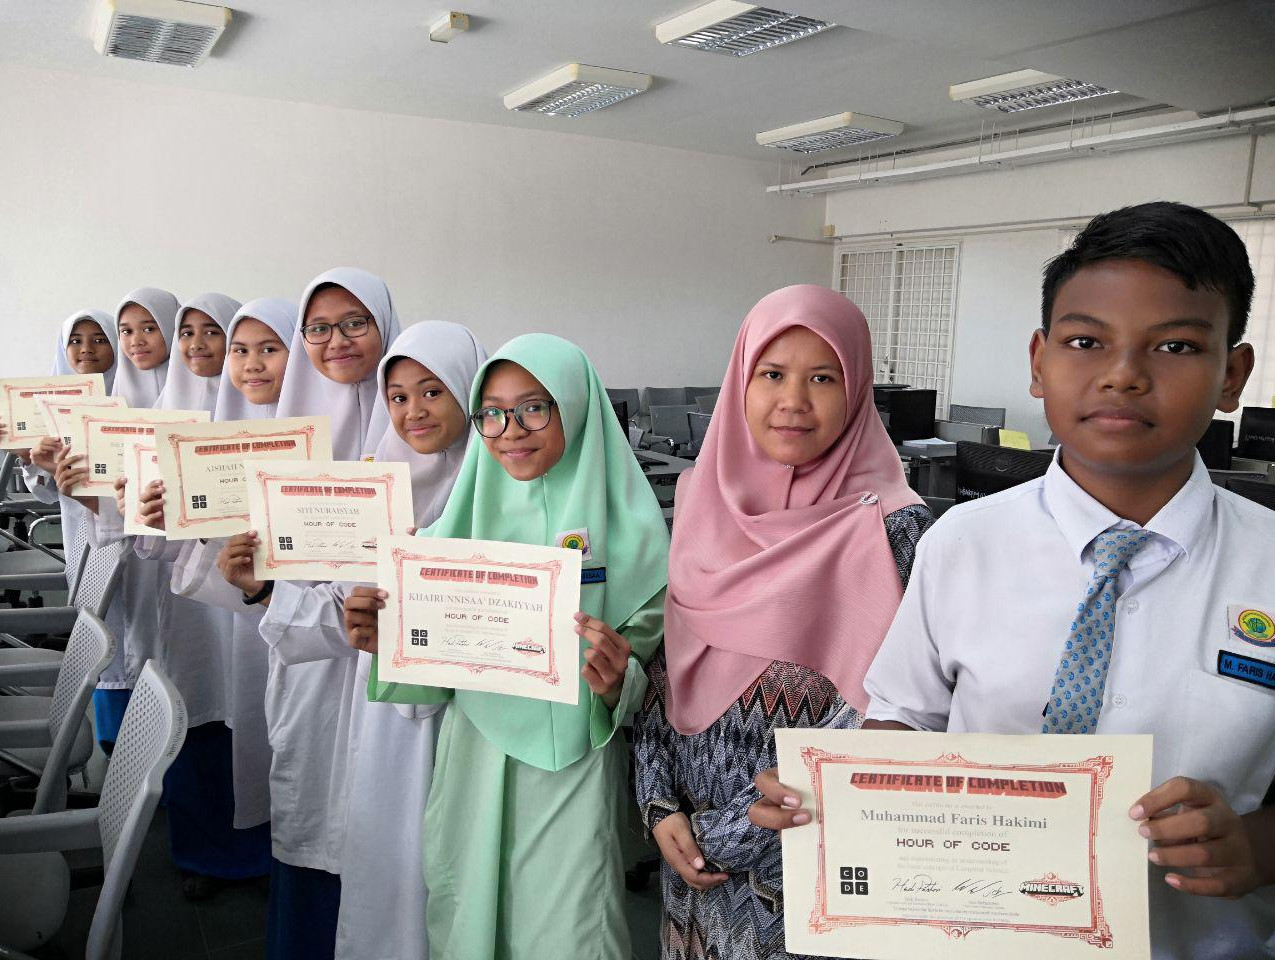 SMK Putrajaya Presint 9(2) (4)